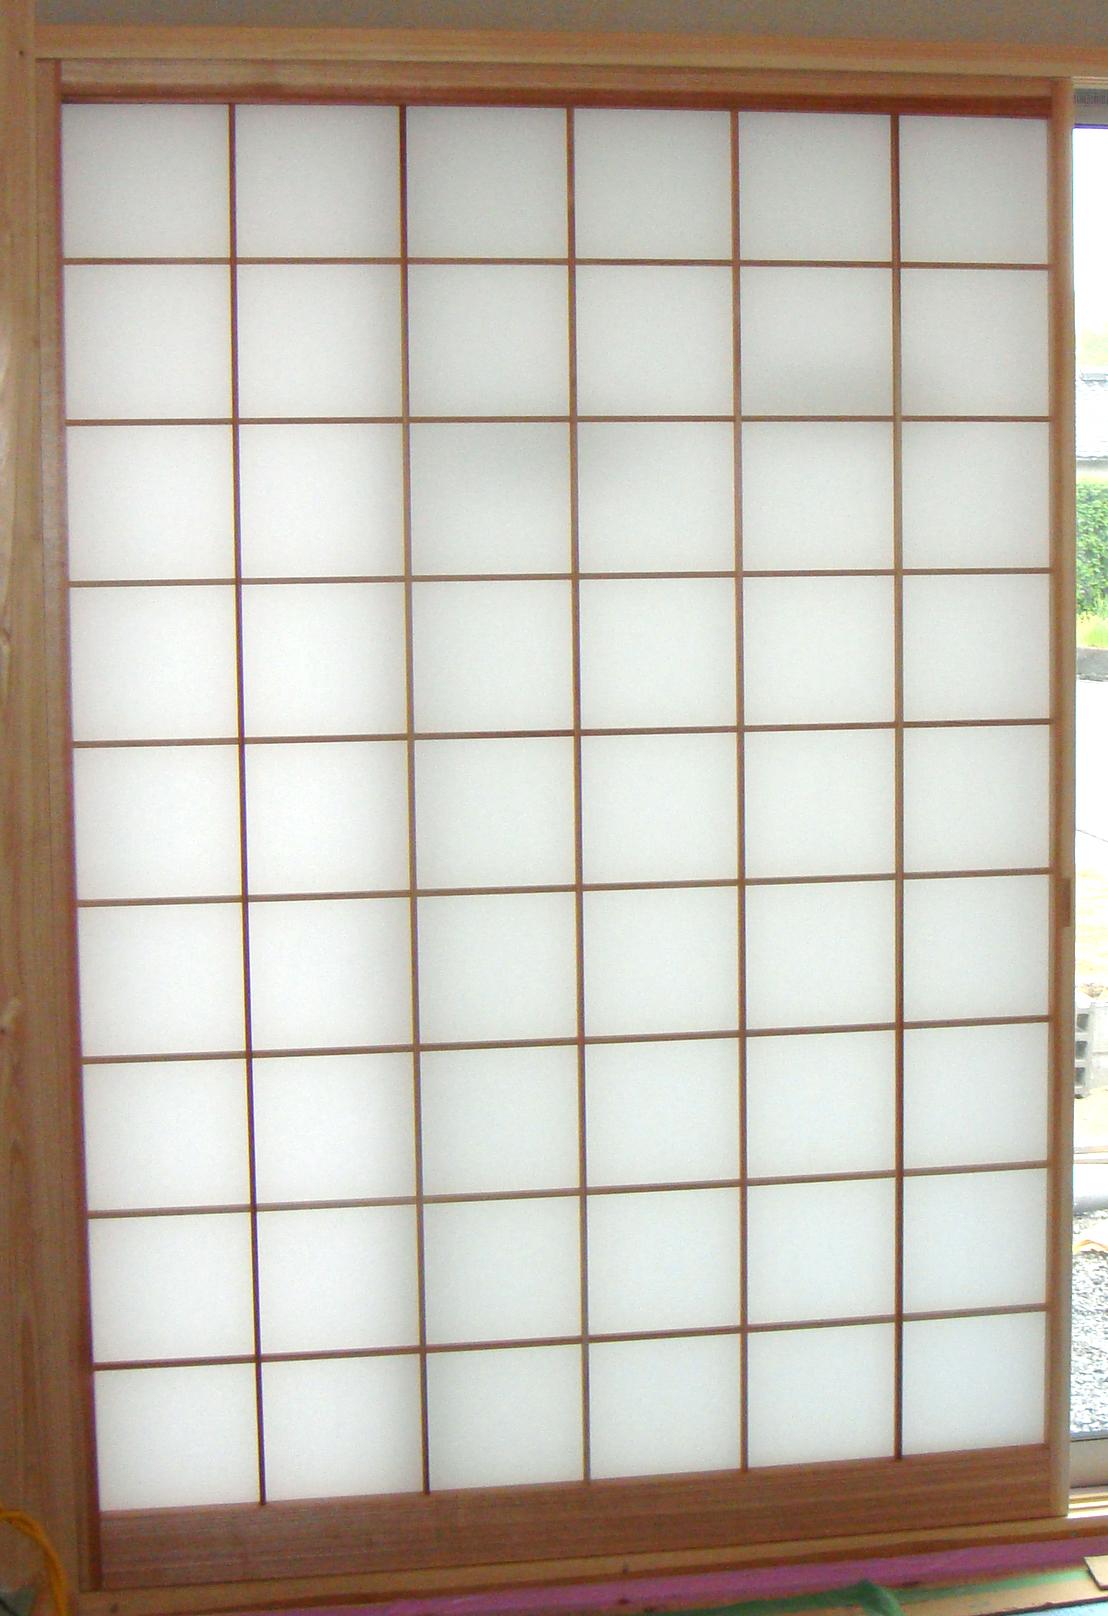 障子No.06-015